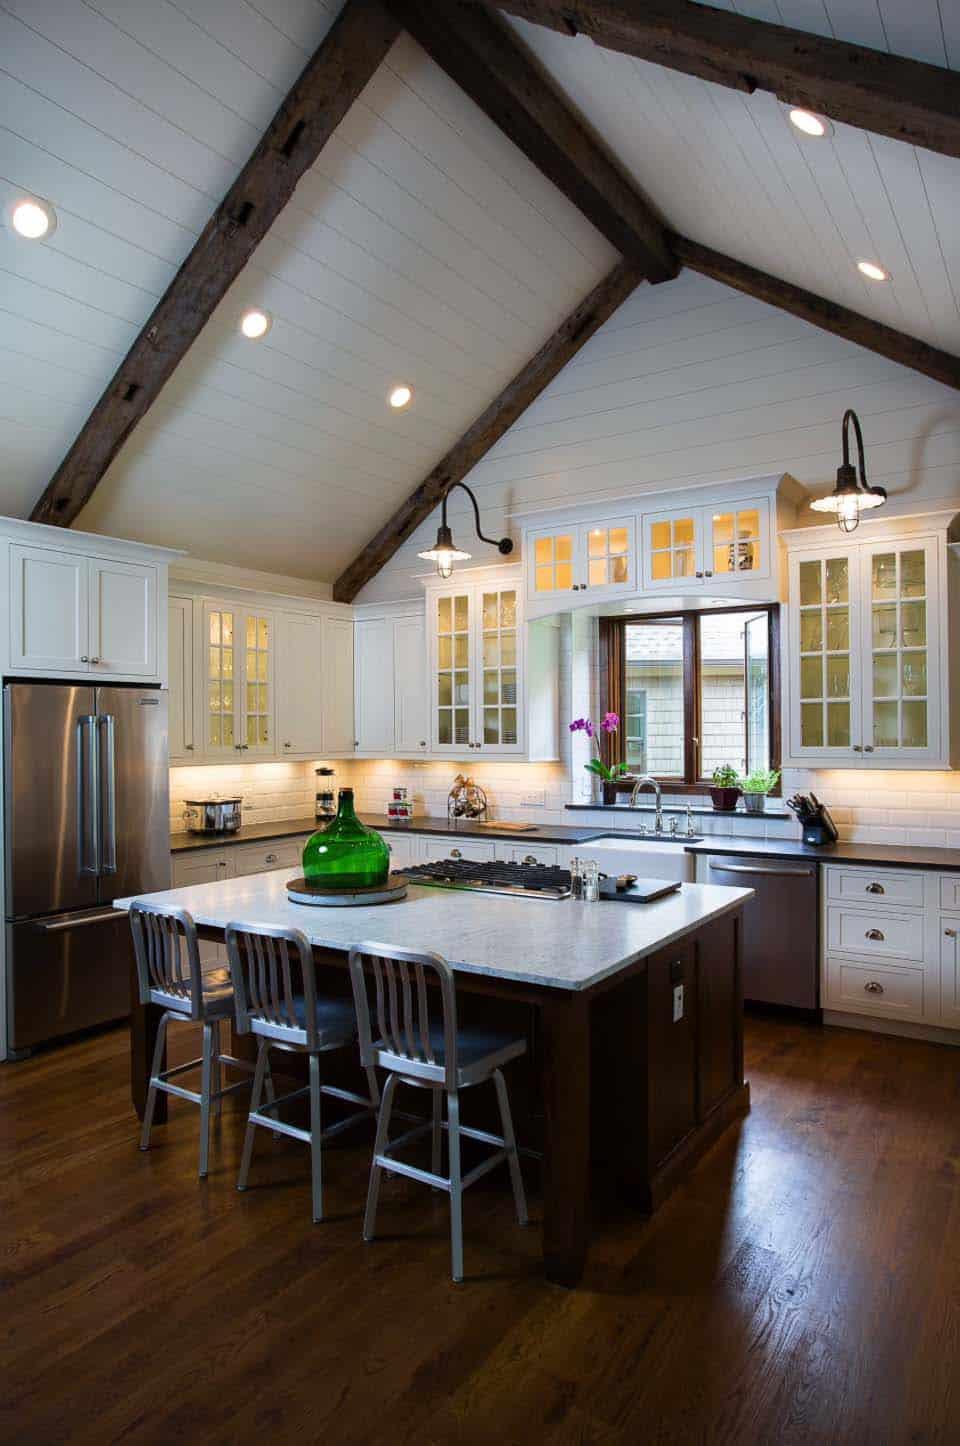 35+ Amazingly creative and stylish farmhouse kitchen ideas on Farm House Kitchen Ideas  id=12049